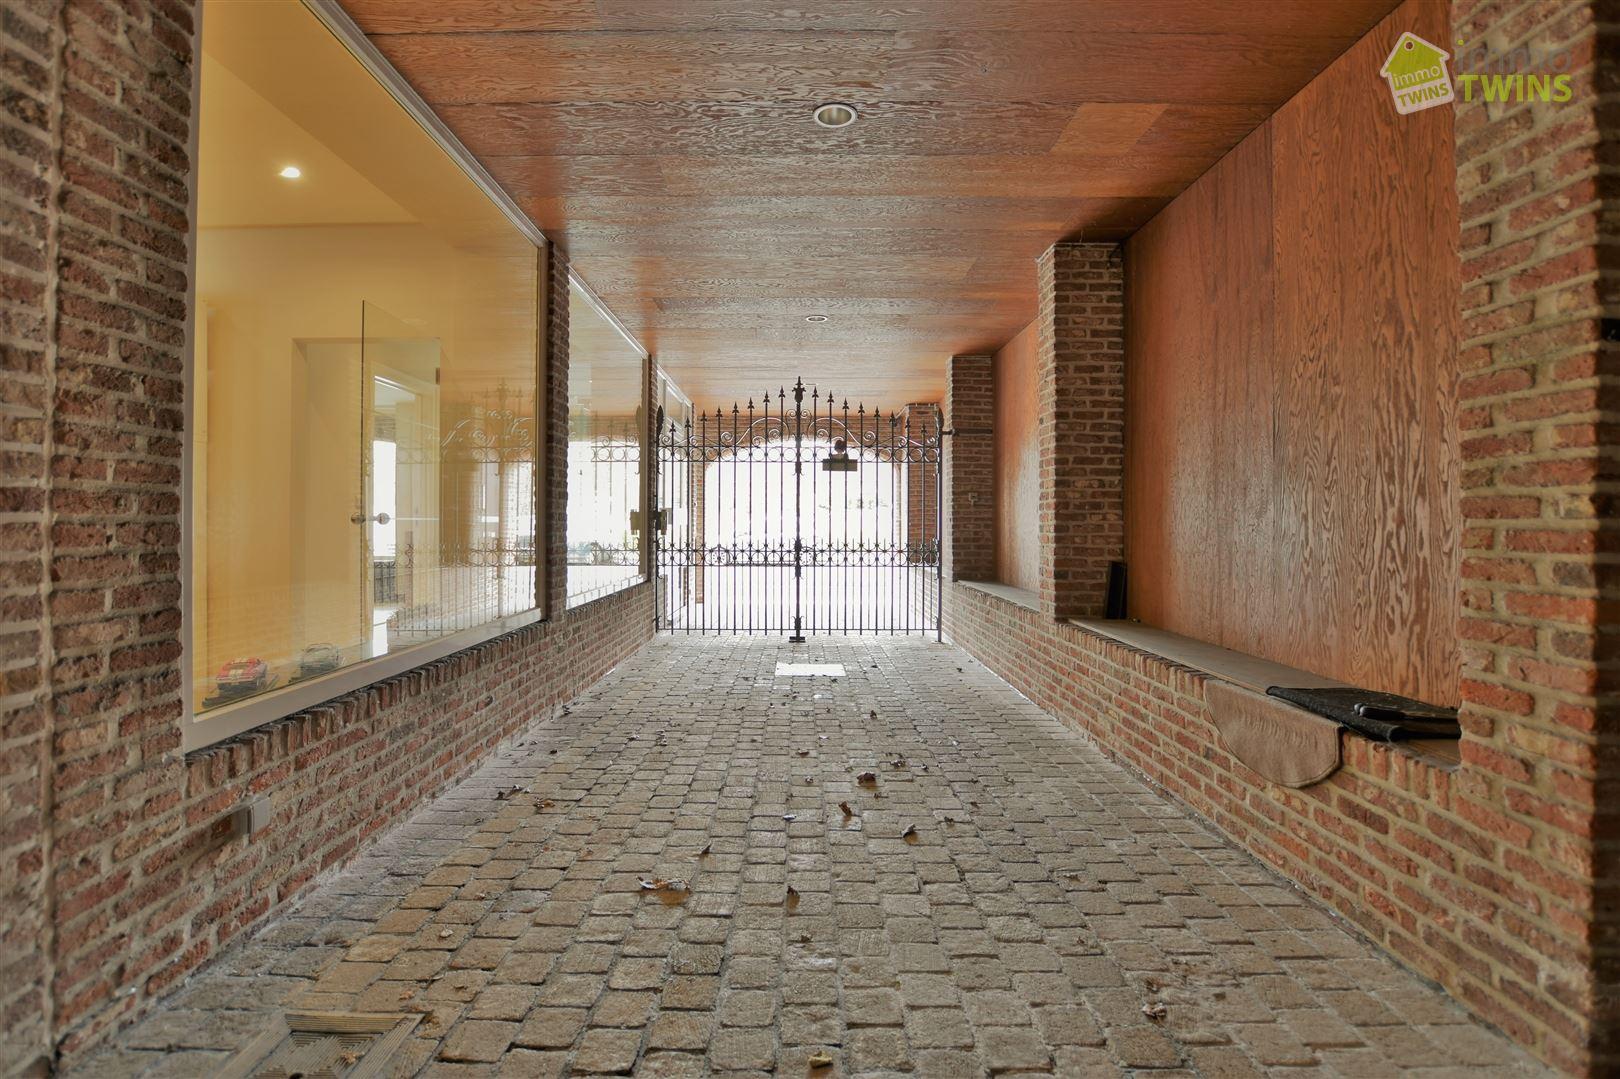 Foto 29 : Duplex/triplex te 9200 Dendermonde (België) - Prijs € 398.000